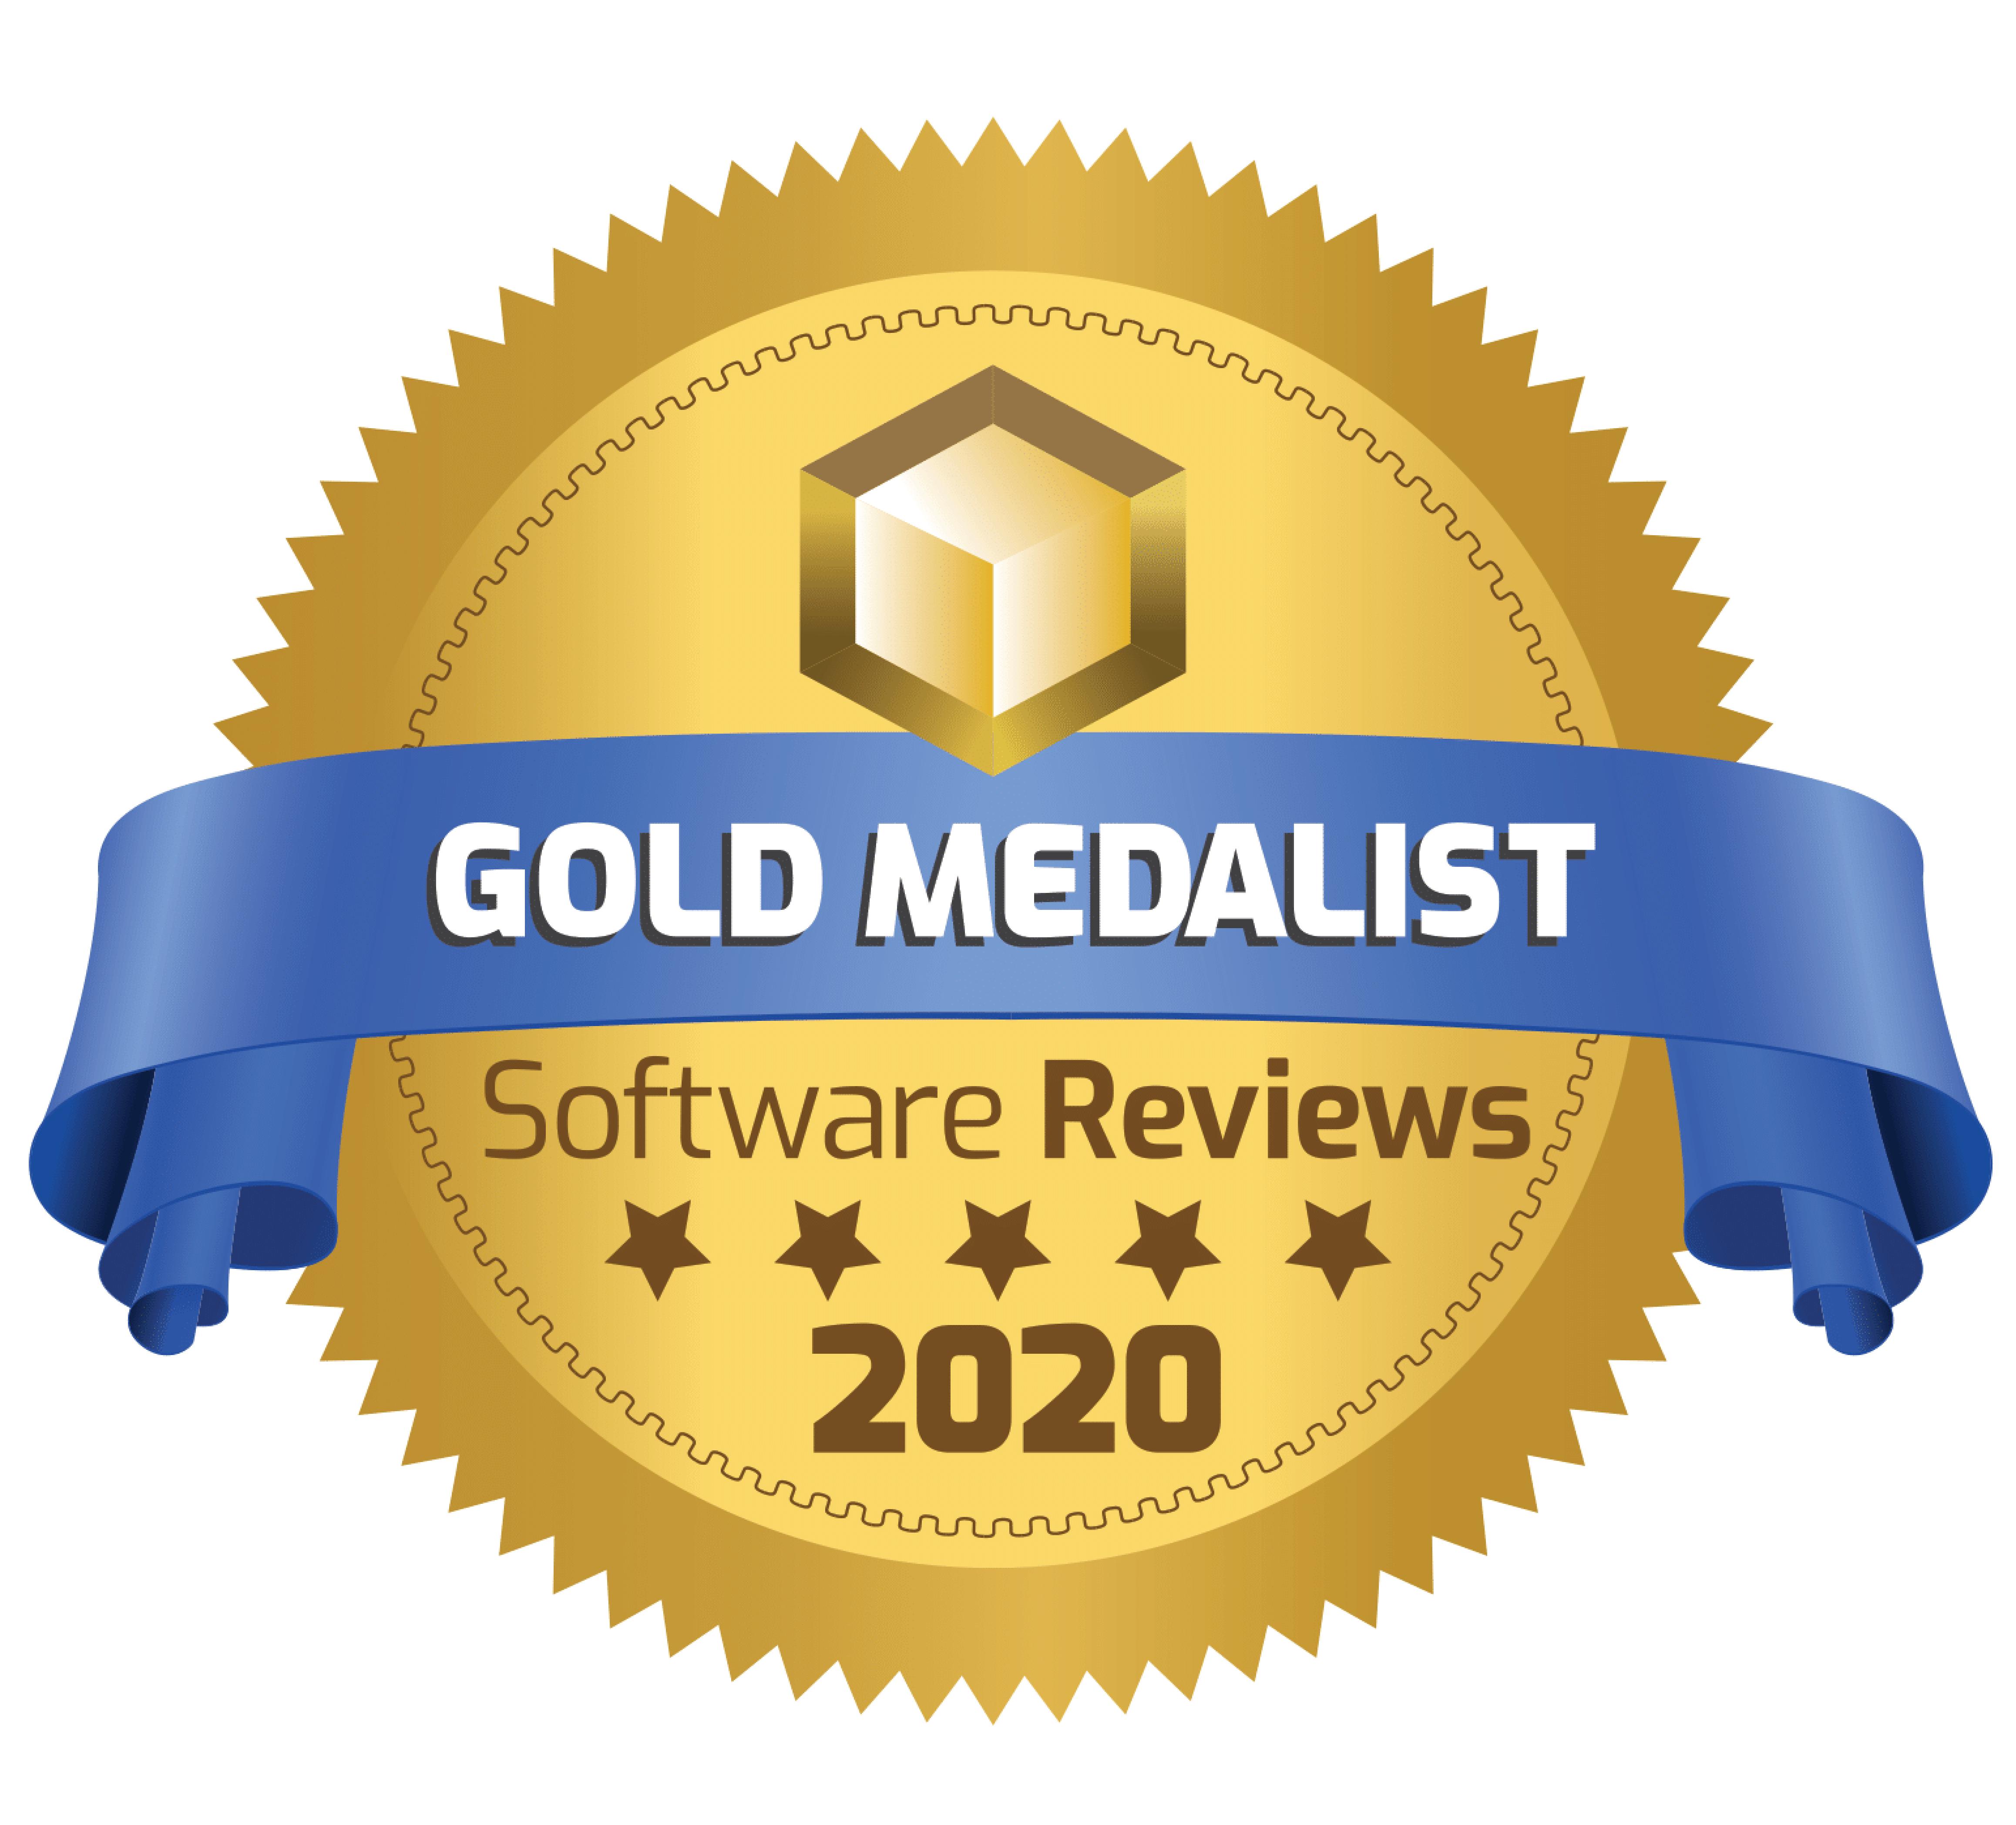 SoftwareReviews Gold Medal badge for 2020